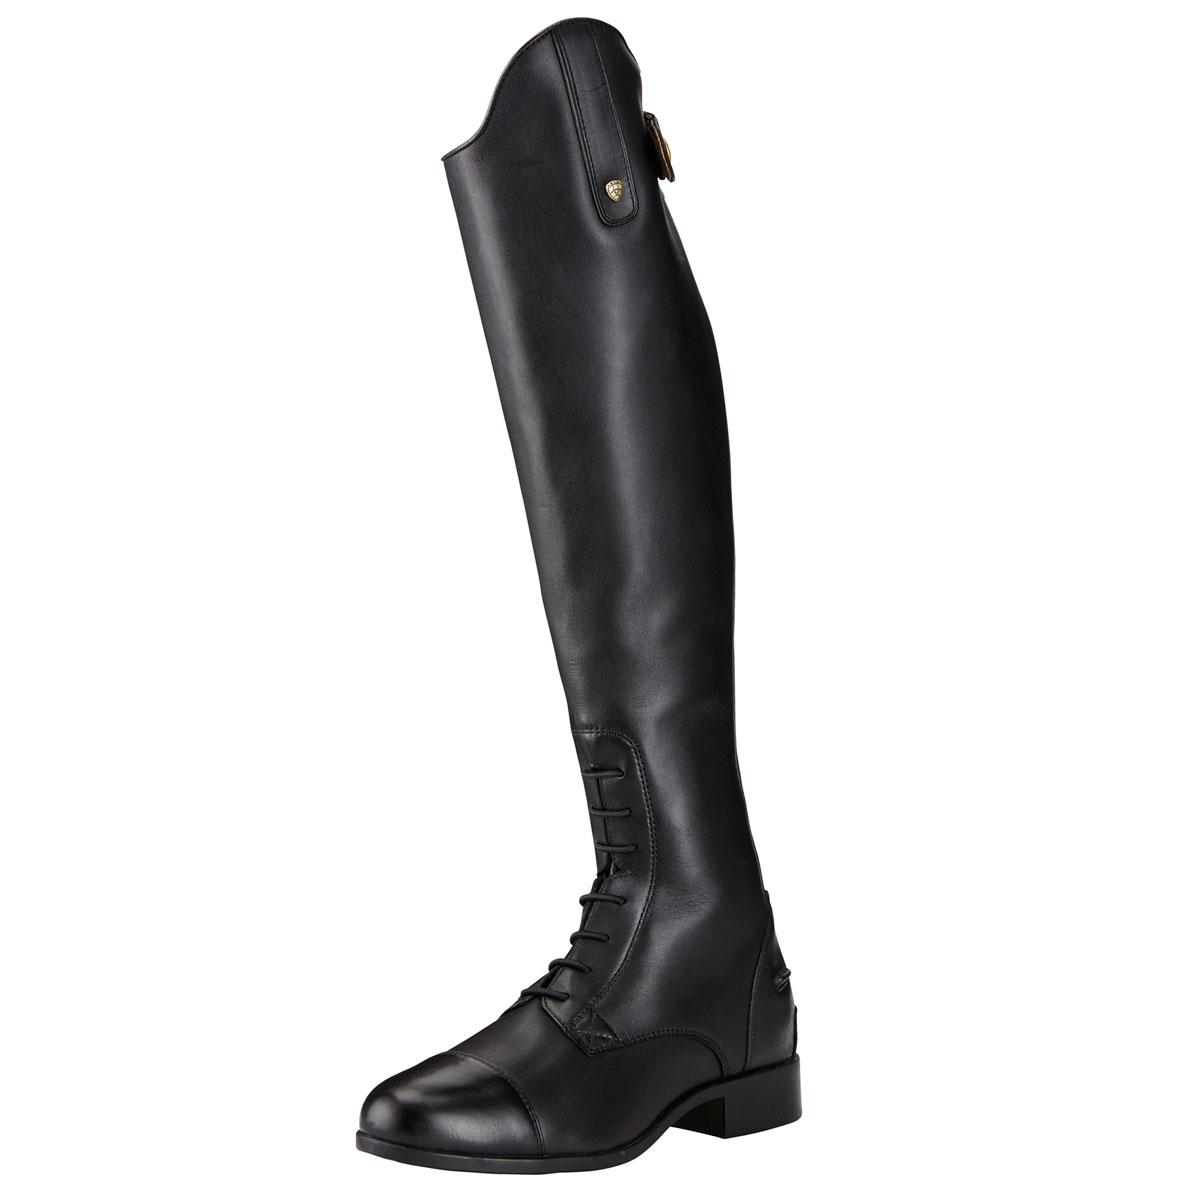 45f3331b0df3 Ariat Heritage Contour II Field Zip Tall Riding Boots - Black - Redpost  Equestrian